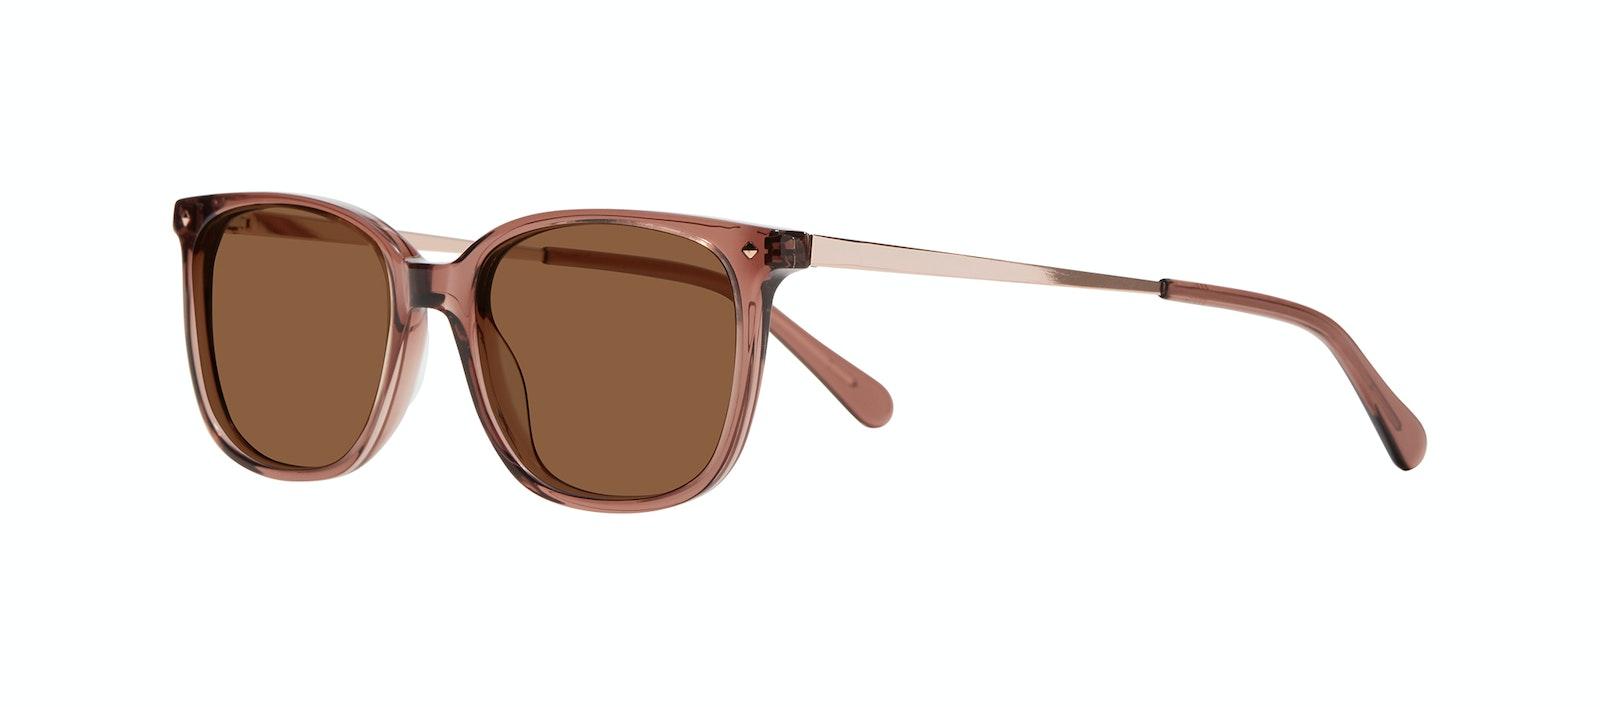 Affordable Fashion Glasses Rectangle Square Sunglasses Women Refine Dark Terra Tilt